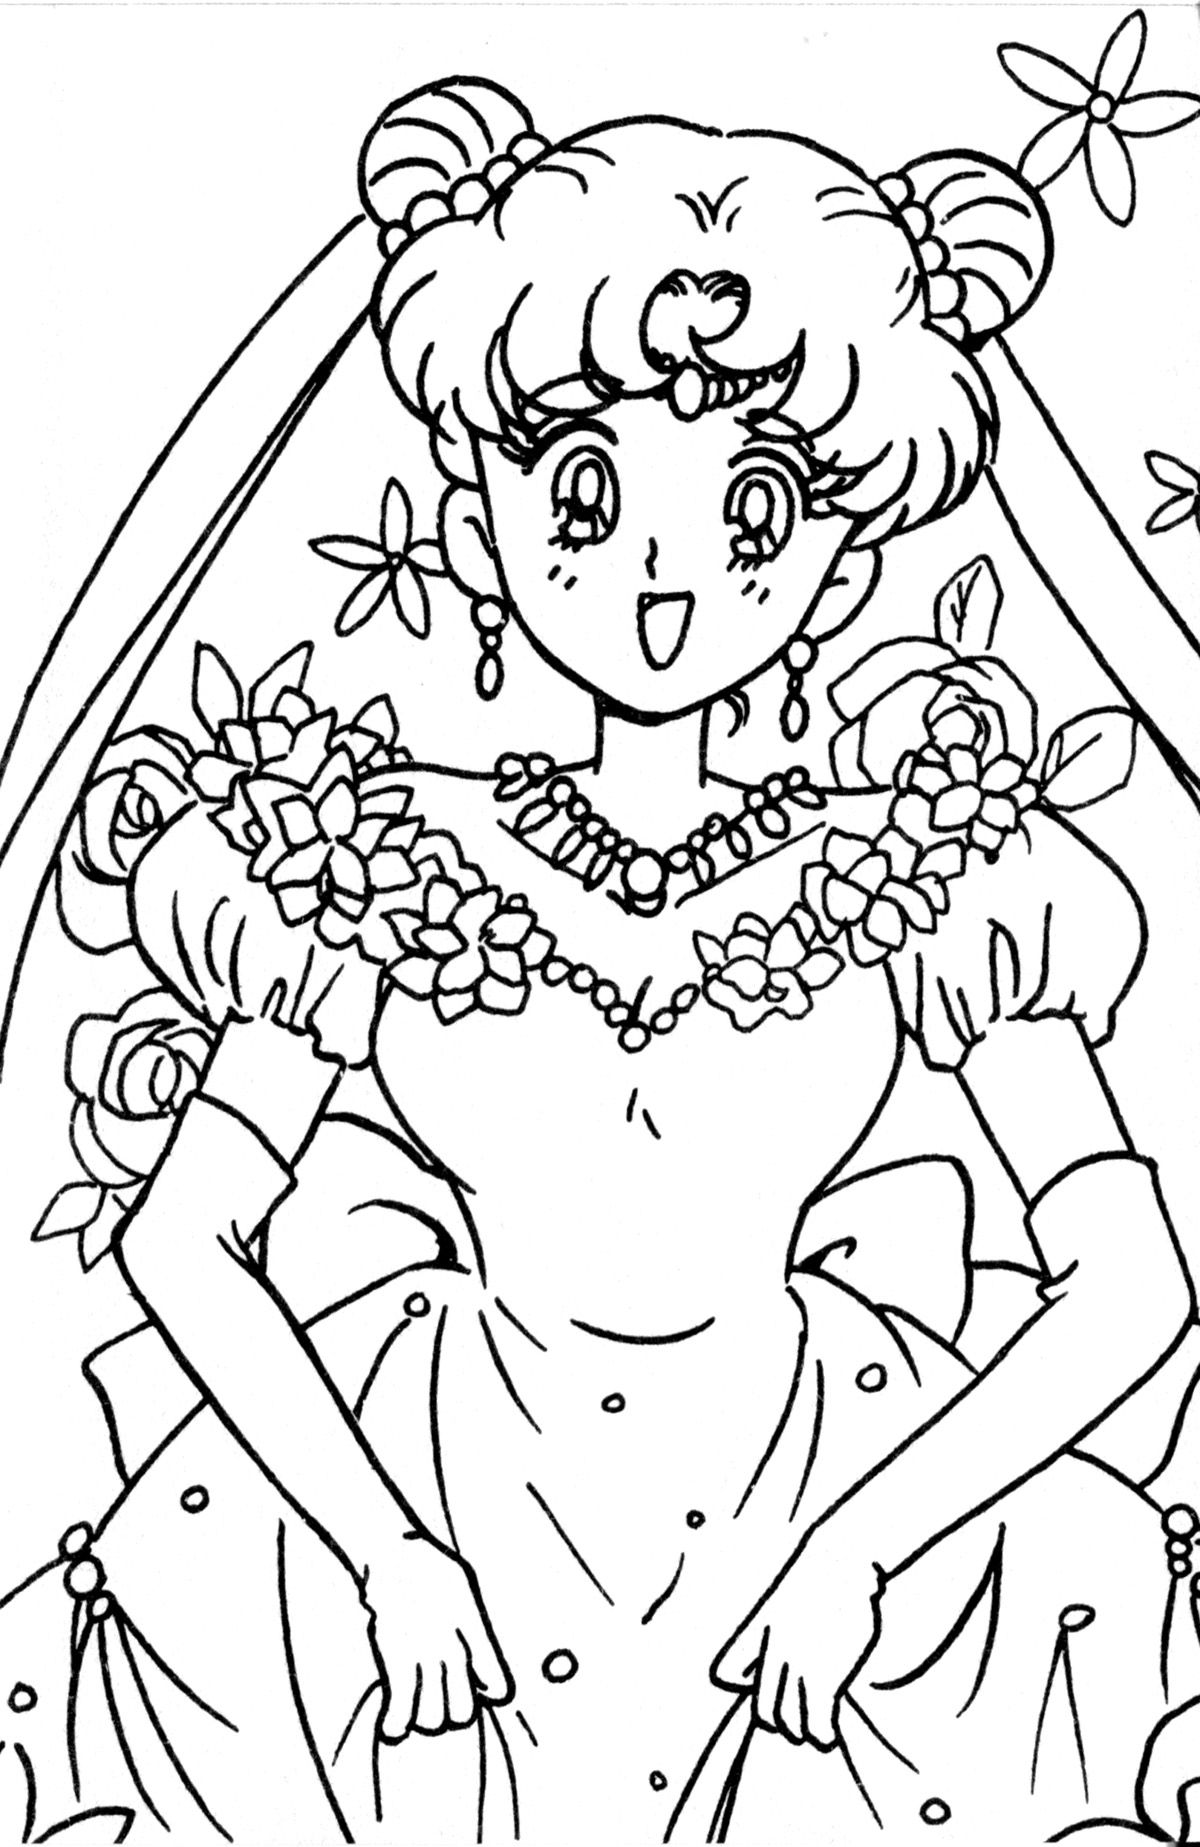 Tsuki Matsuri The Sailormoon Coloring Book Archive Sailor Moon Coloring Pages Coloring Books Cute Coloring Pages [ 1847 x 1200 Pixel ]